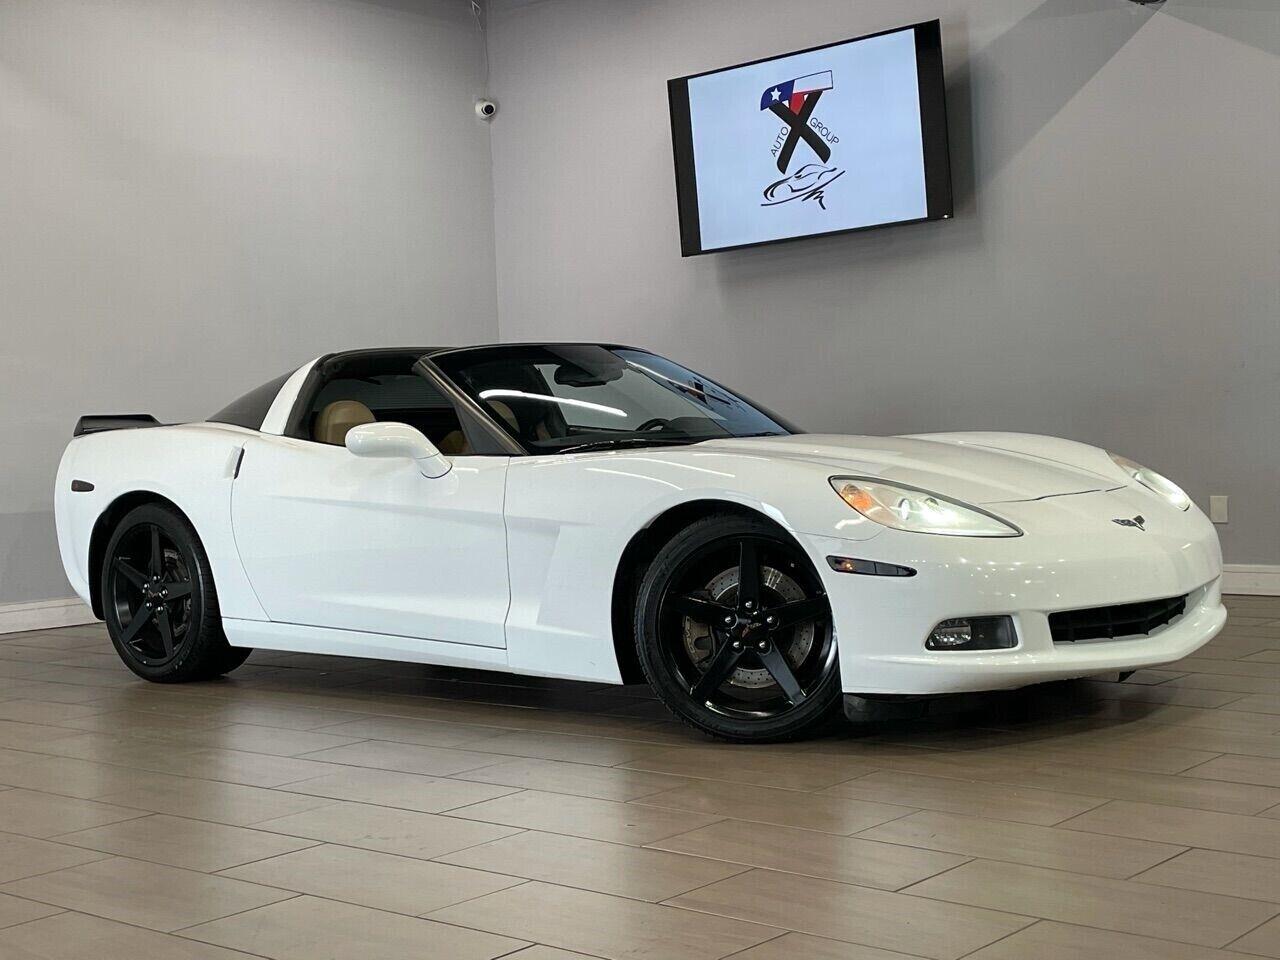 2007 White Chevrolet Corvette Coupe  | C6 Corvette Photo 1